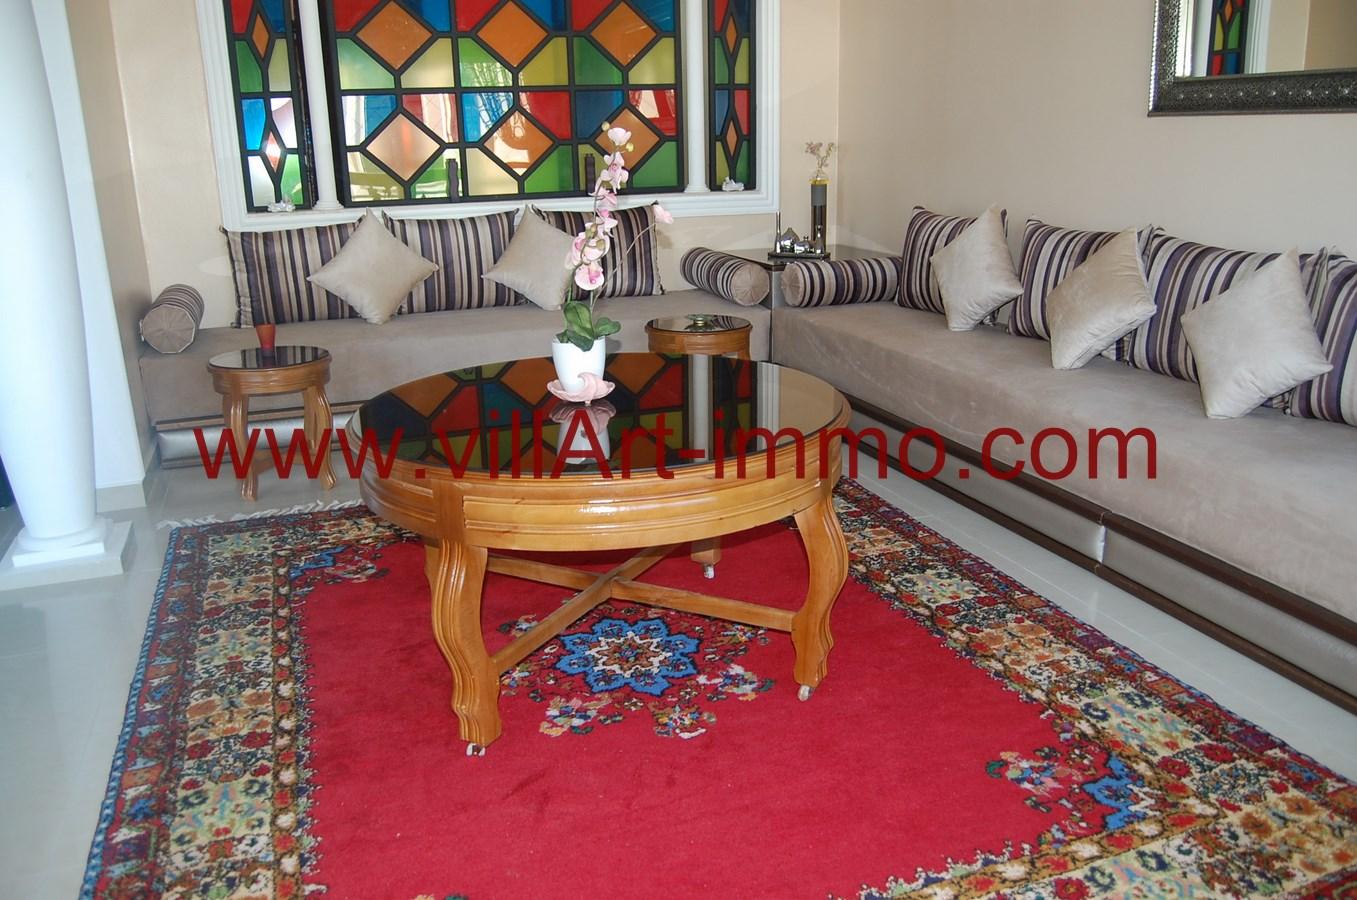 4-vente-appartement-tanger-iberia-salon-4-va435-villart-immo